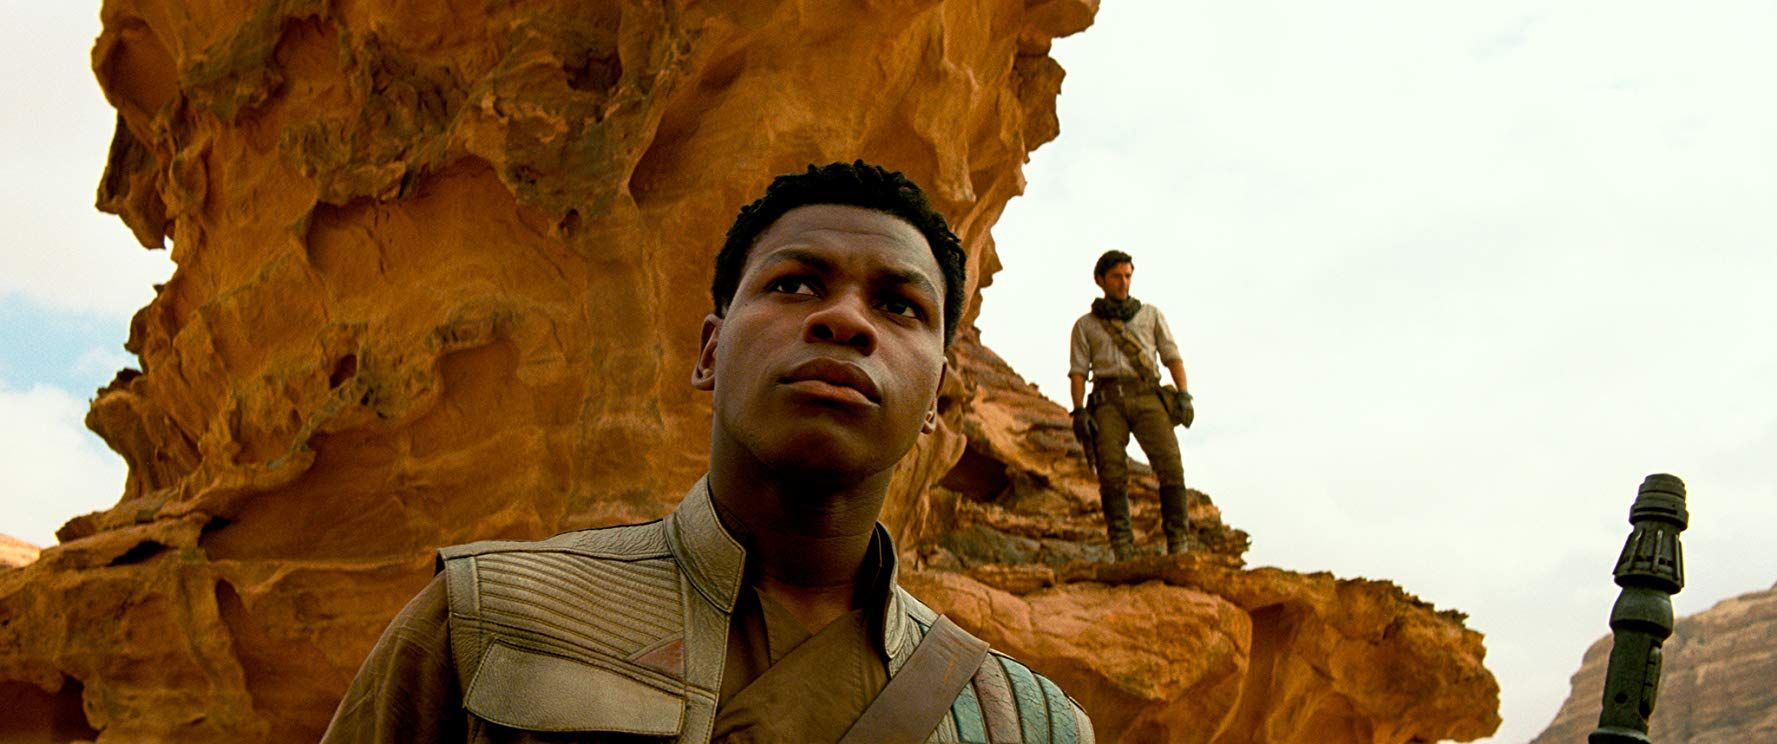 Imagen 3 de Star Wars: El Ascenso de Skywalker